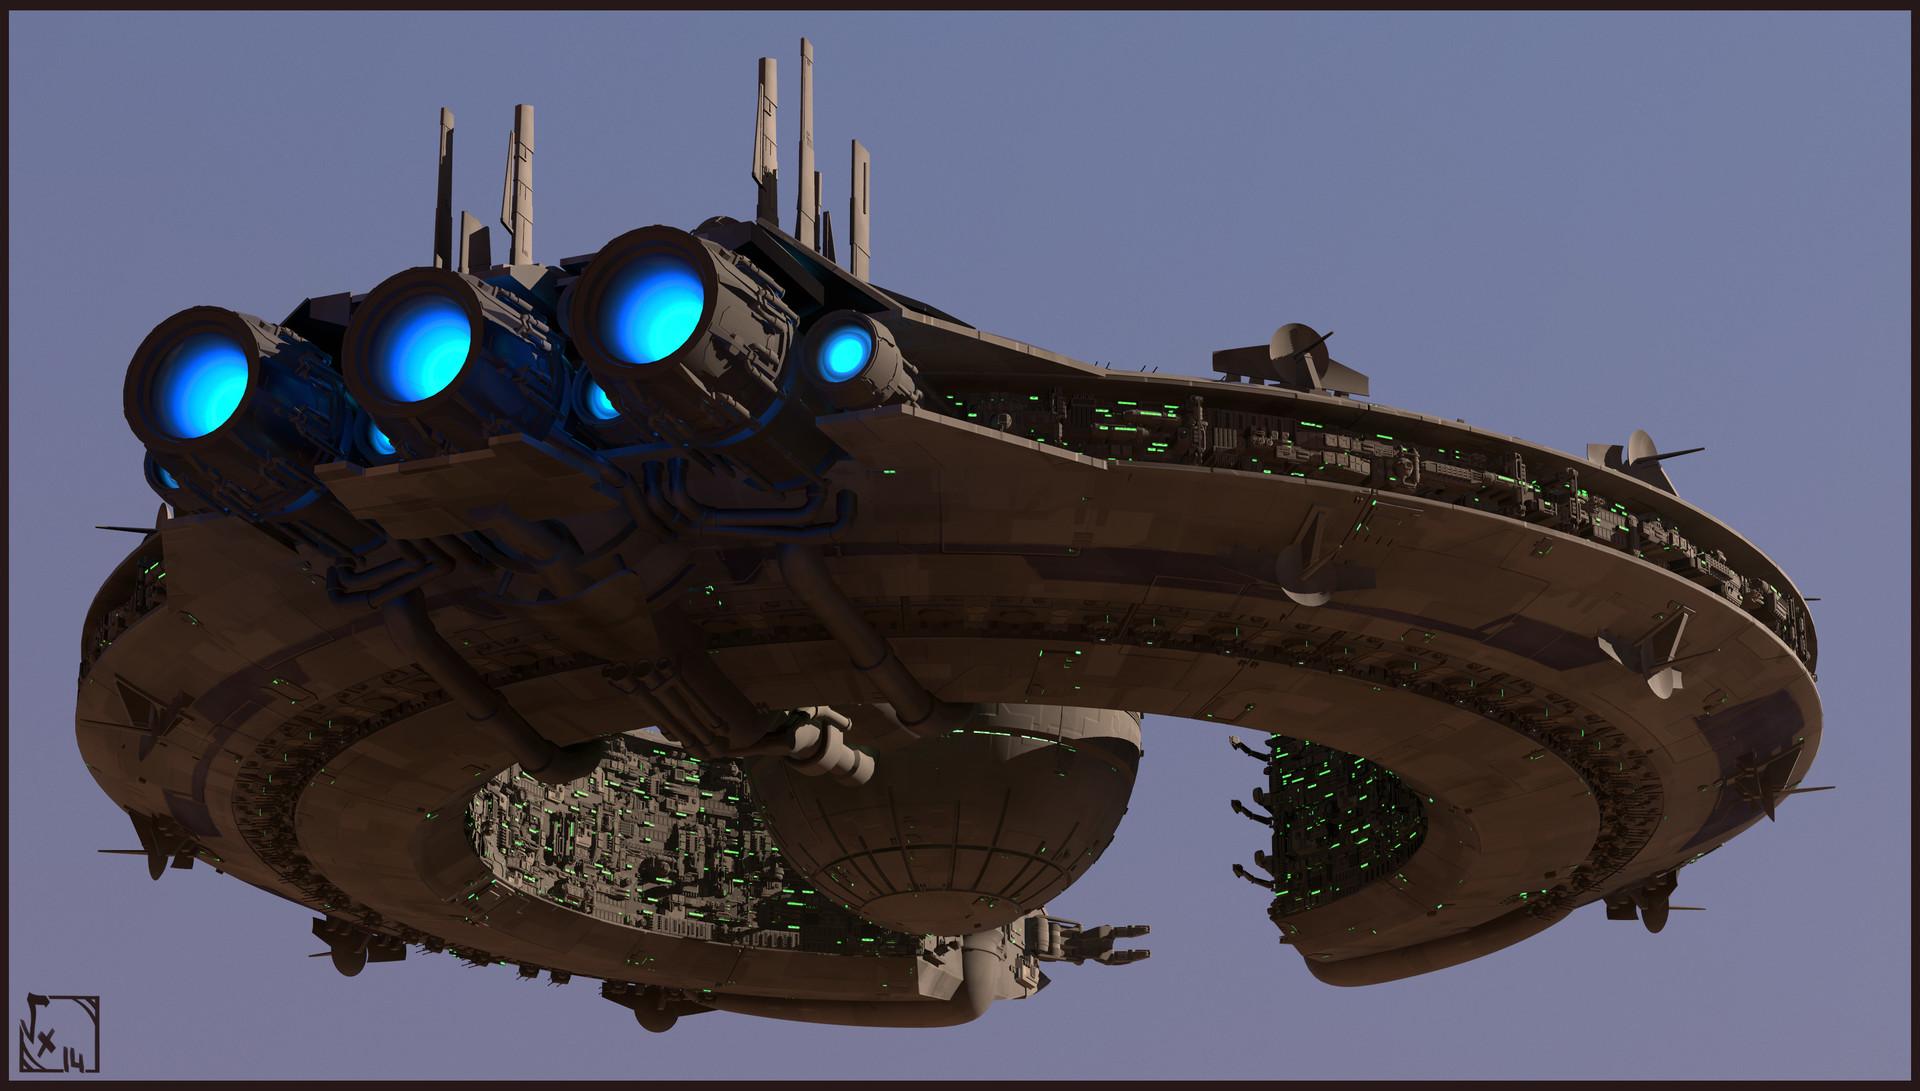 etienne-beschet-prp-destroyer-csi-class-